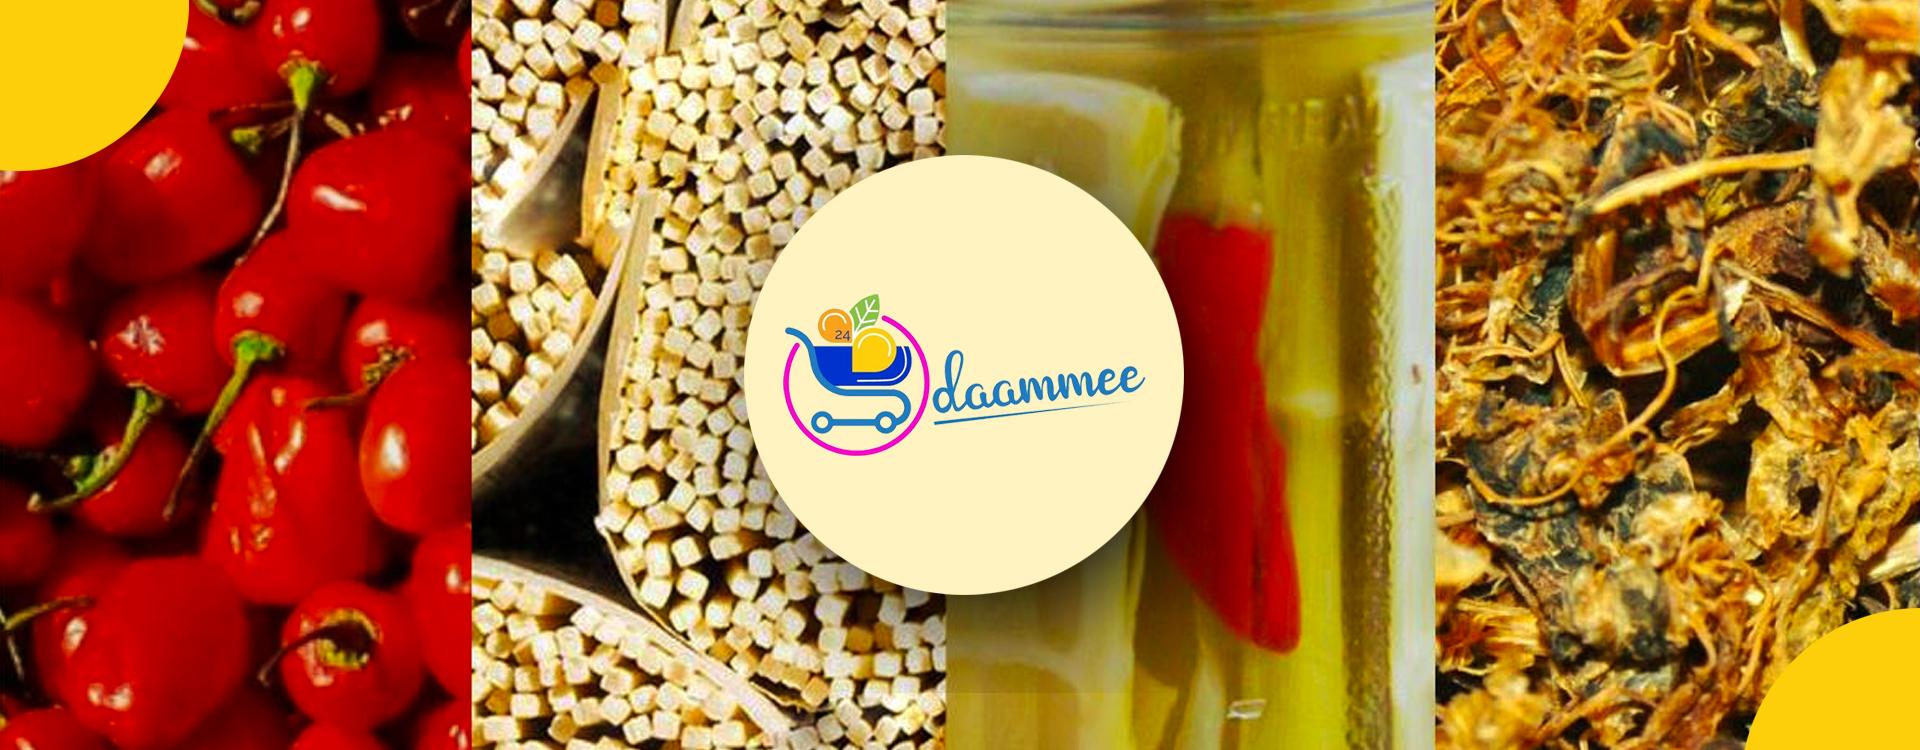 Daammee Darjeeling Start-up E-commerce